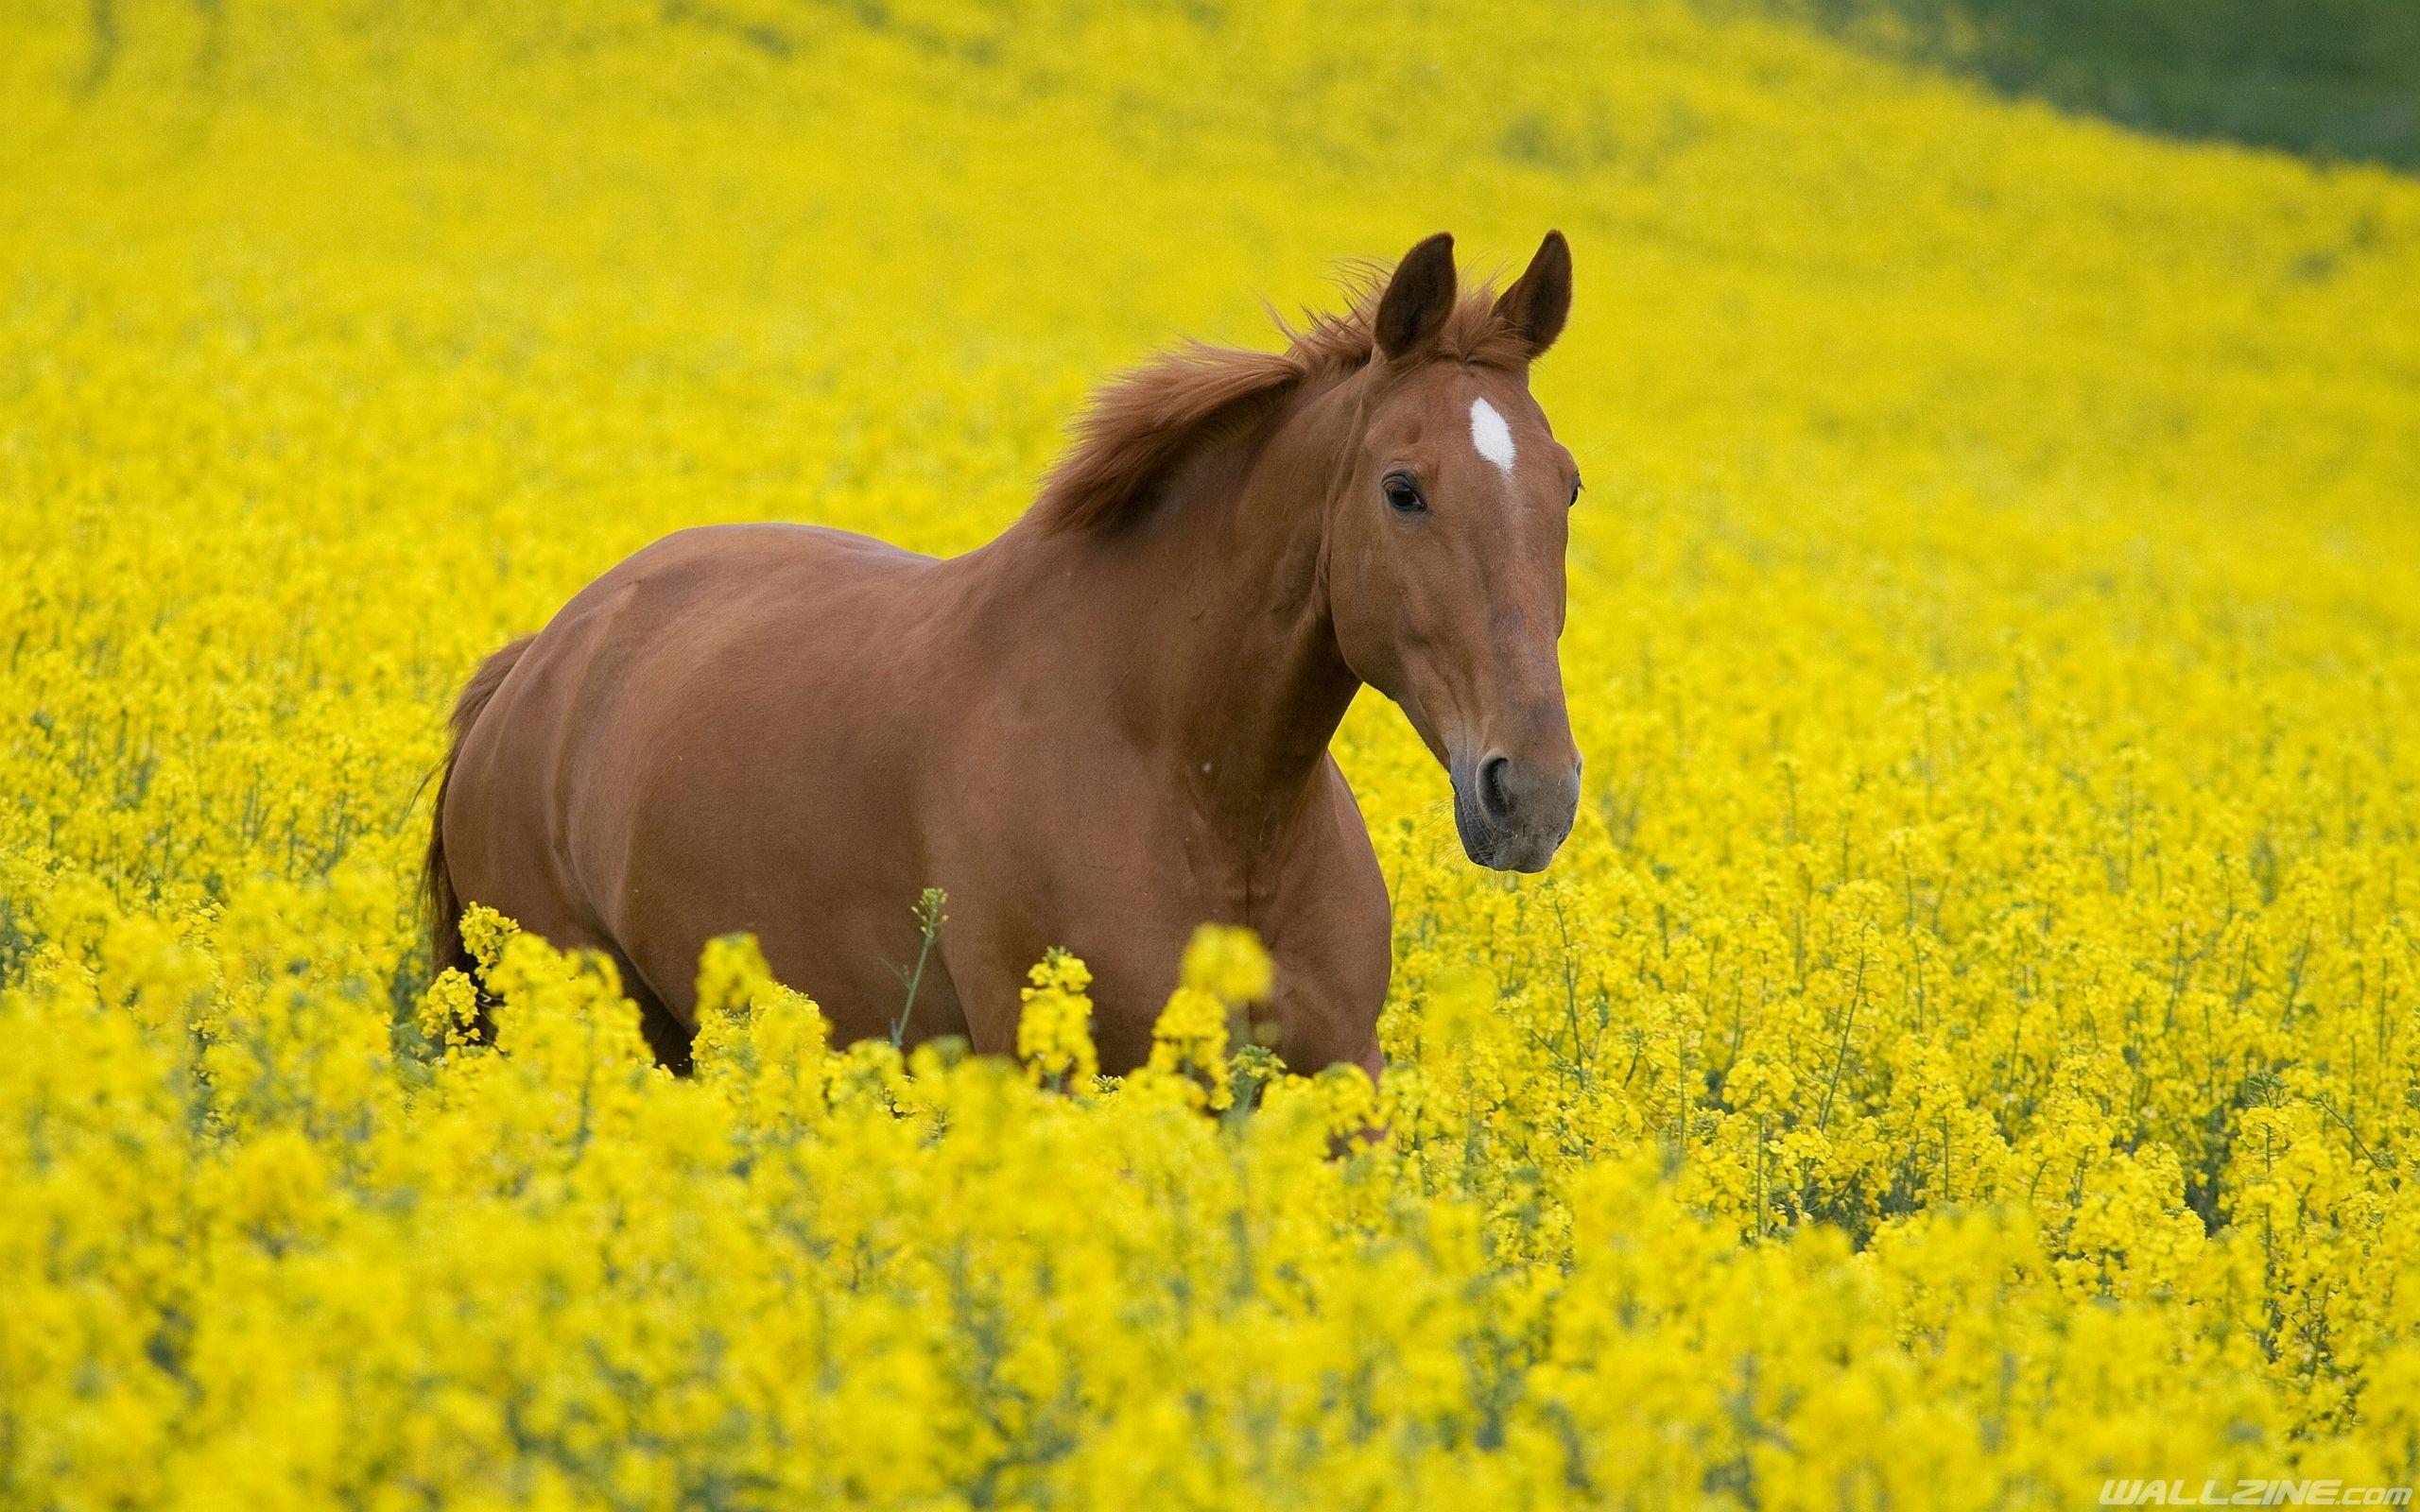 Beautiful Wallpaper Horse Yellow - 44d2c34109187688b63bd8a577d378b9  Graphic_644964.jpg